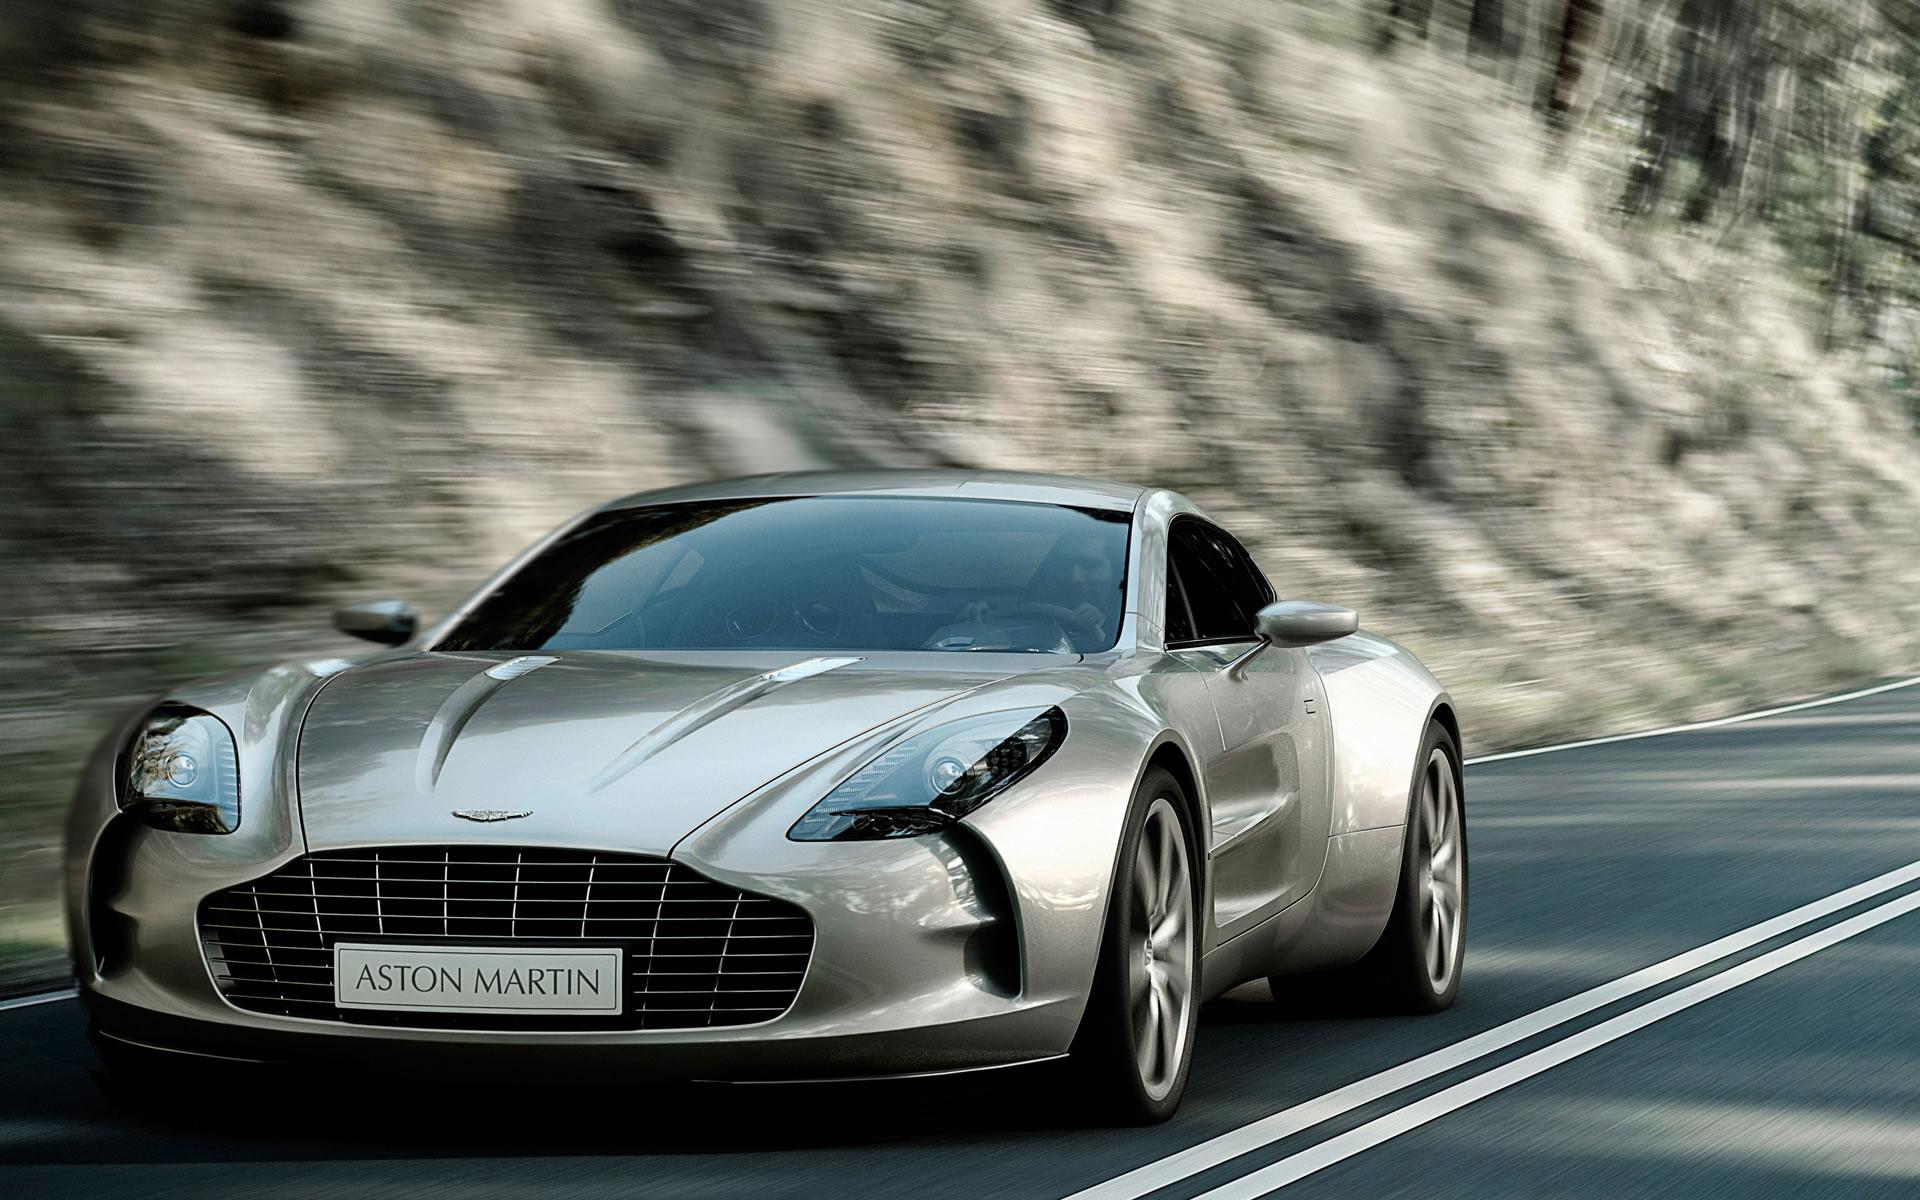 Marbella car dealer sells Aston Martin One-77